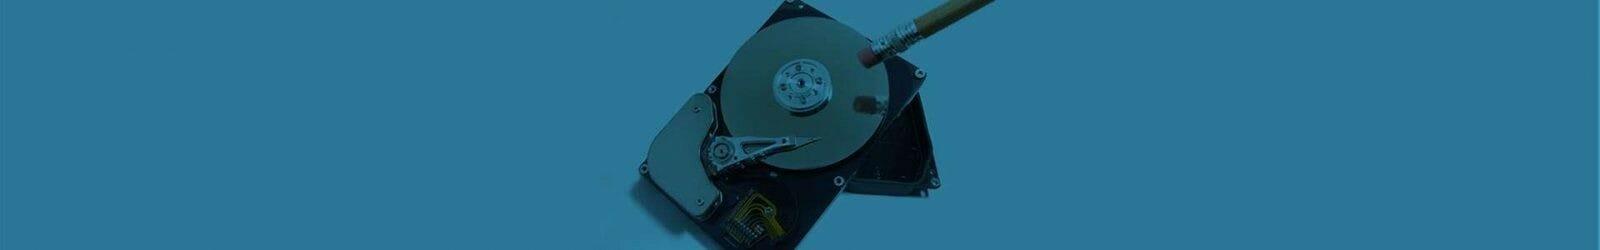 kasowanie danych Kasowanie danych kaso